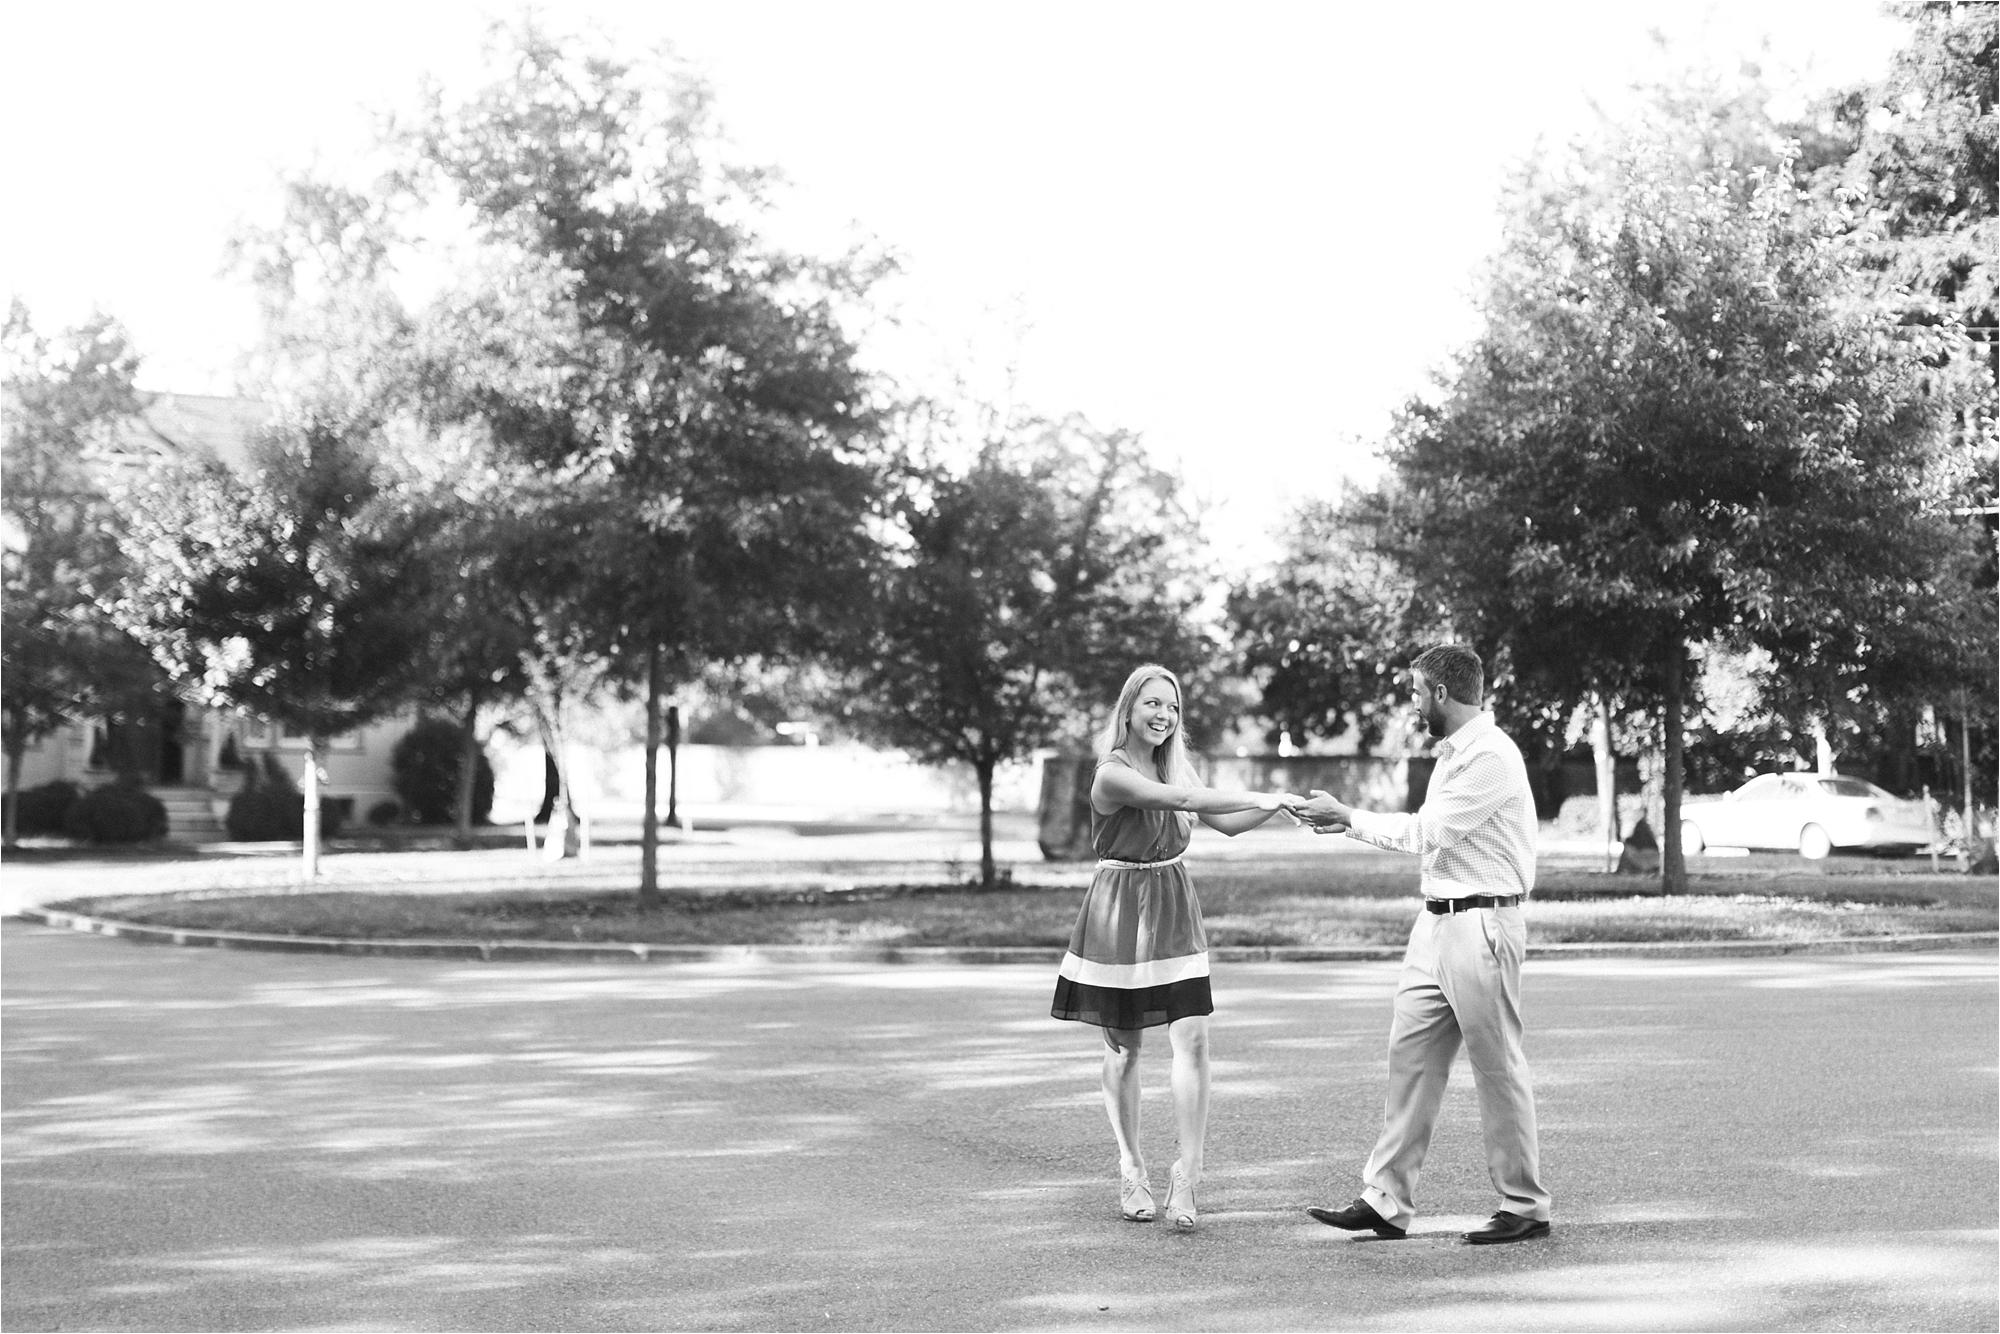 stephanie-yonce-dowtown-fredericksburg-virginia-engagement-photos_0012.jpg